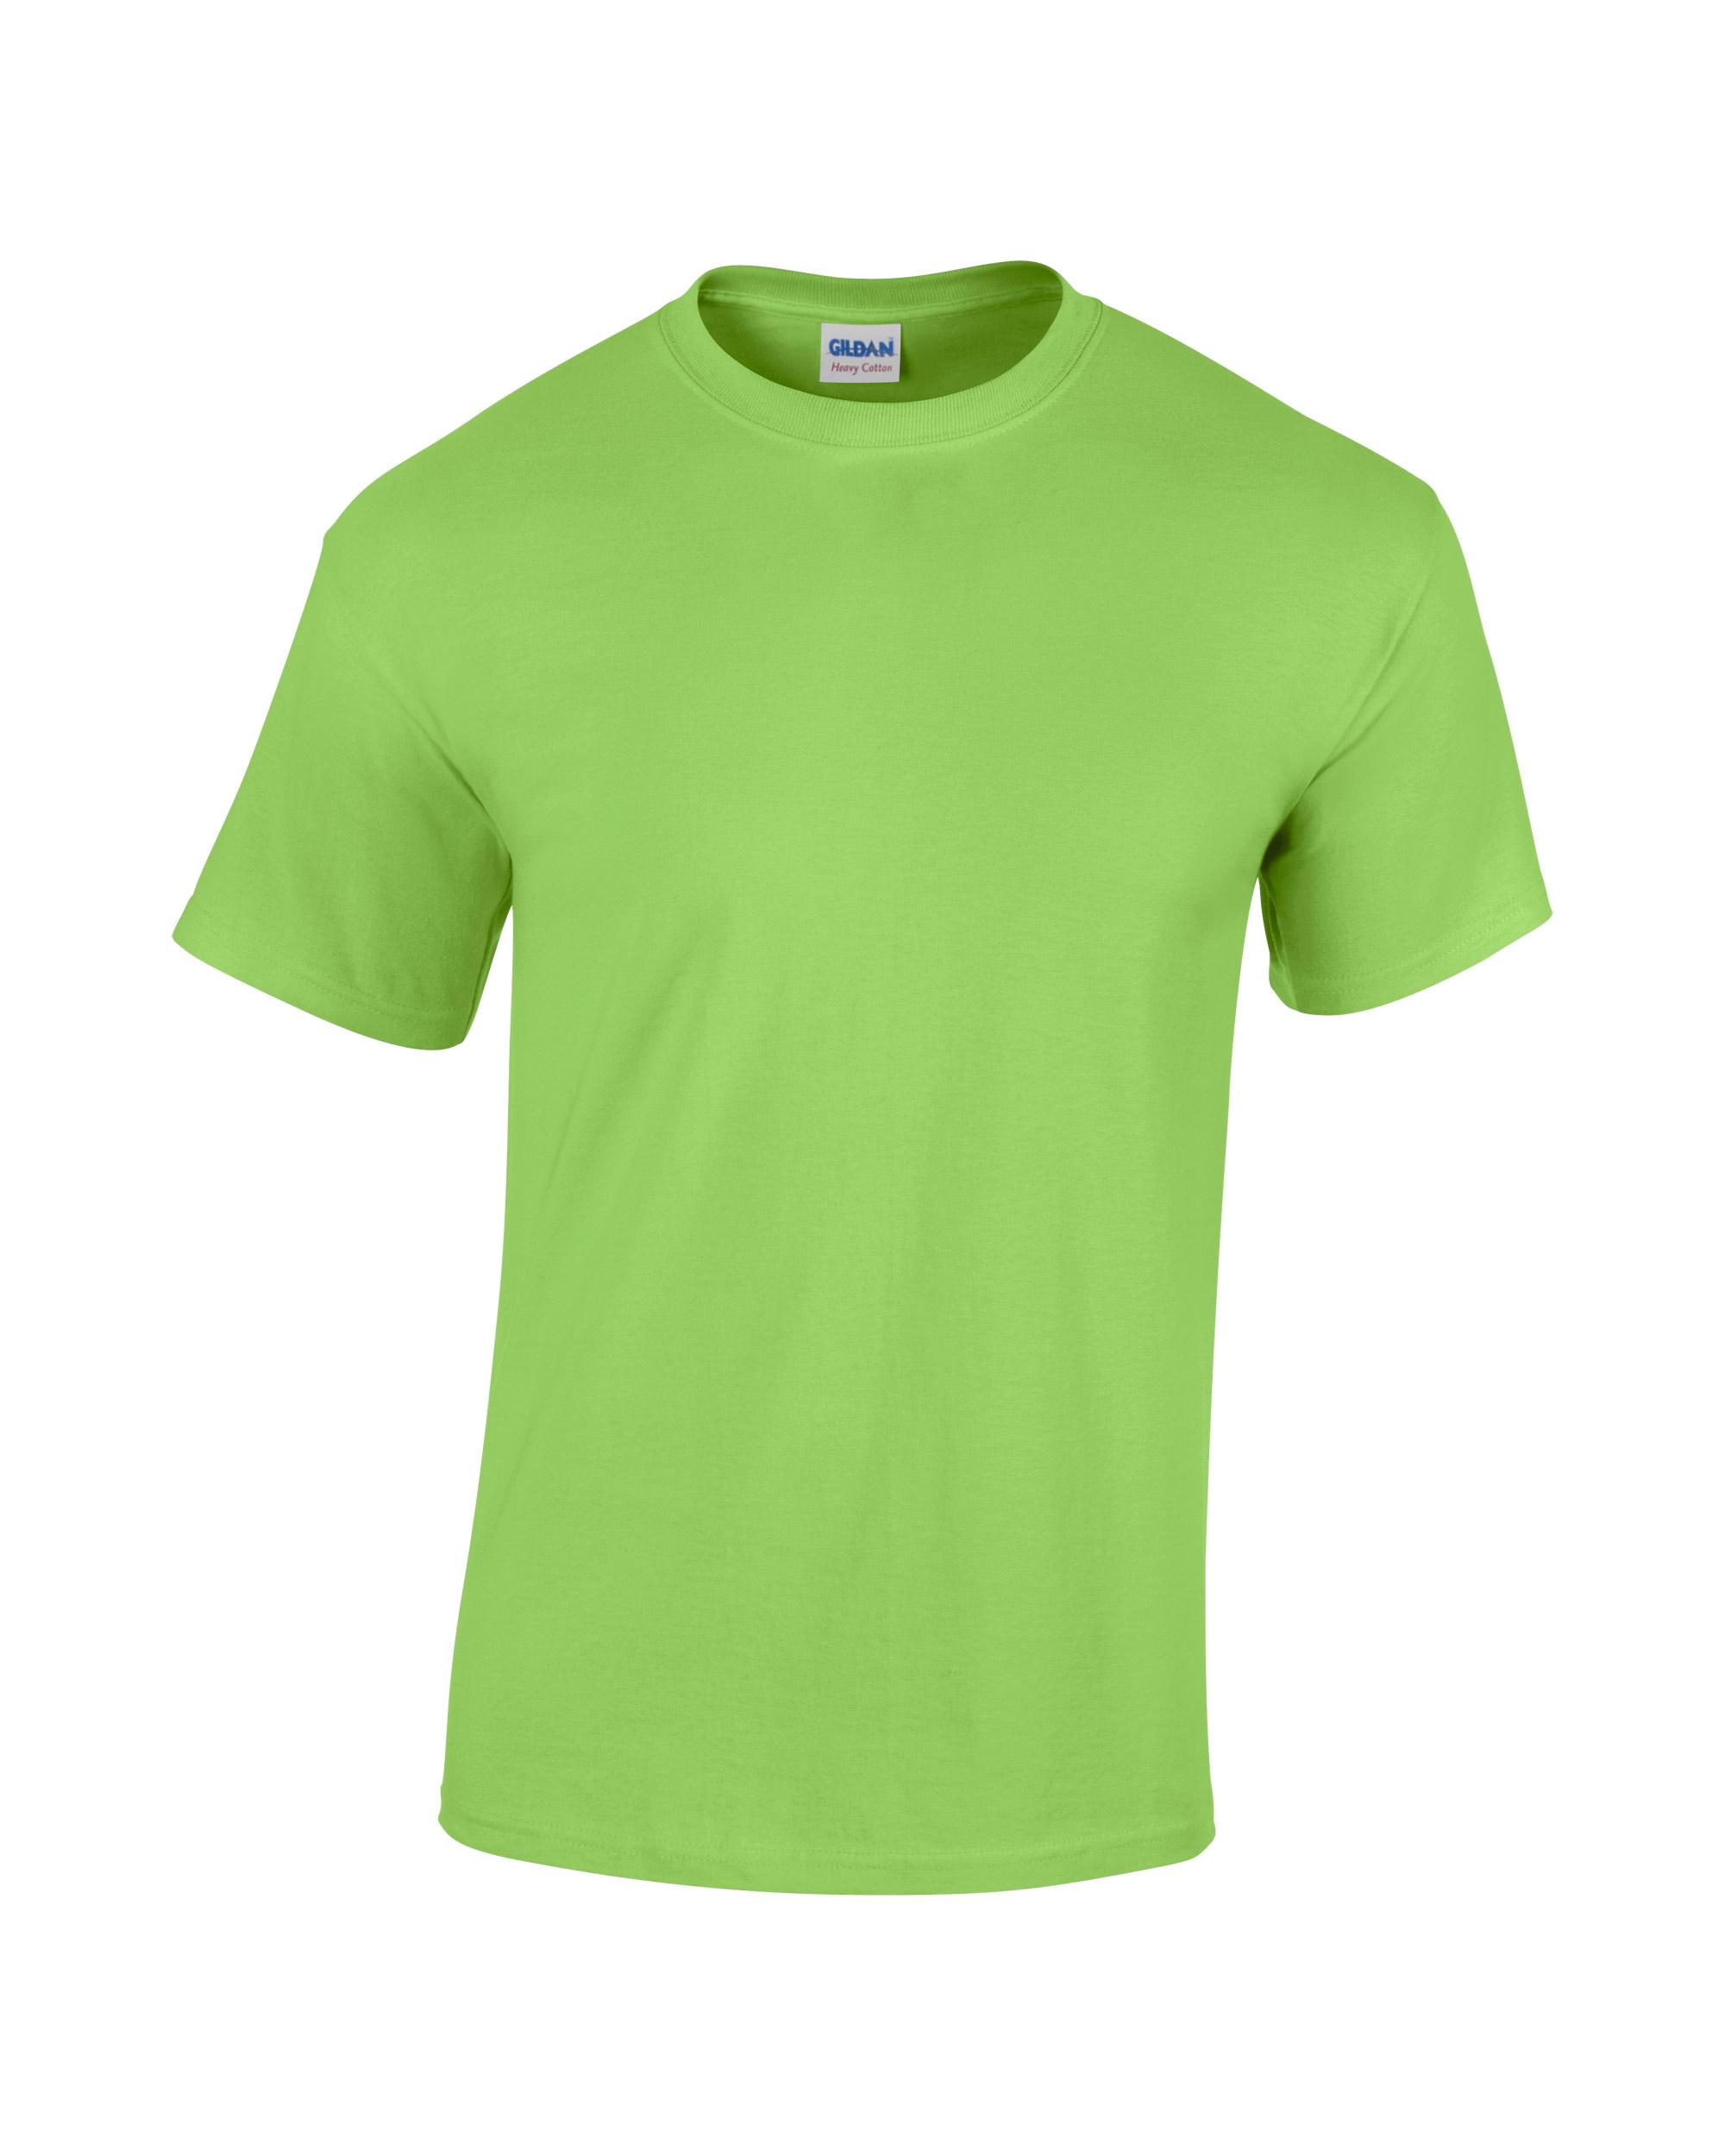 Shirt design boy 2016 -  5000 7488c_lime 5 3 Oz Heavy Cotton Mens Shirts Ladies Shirts